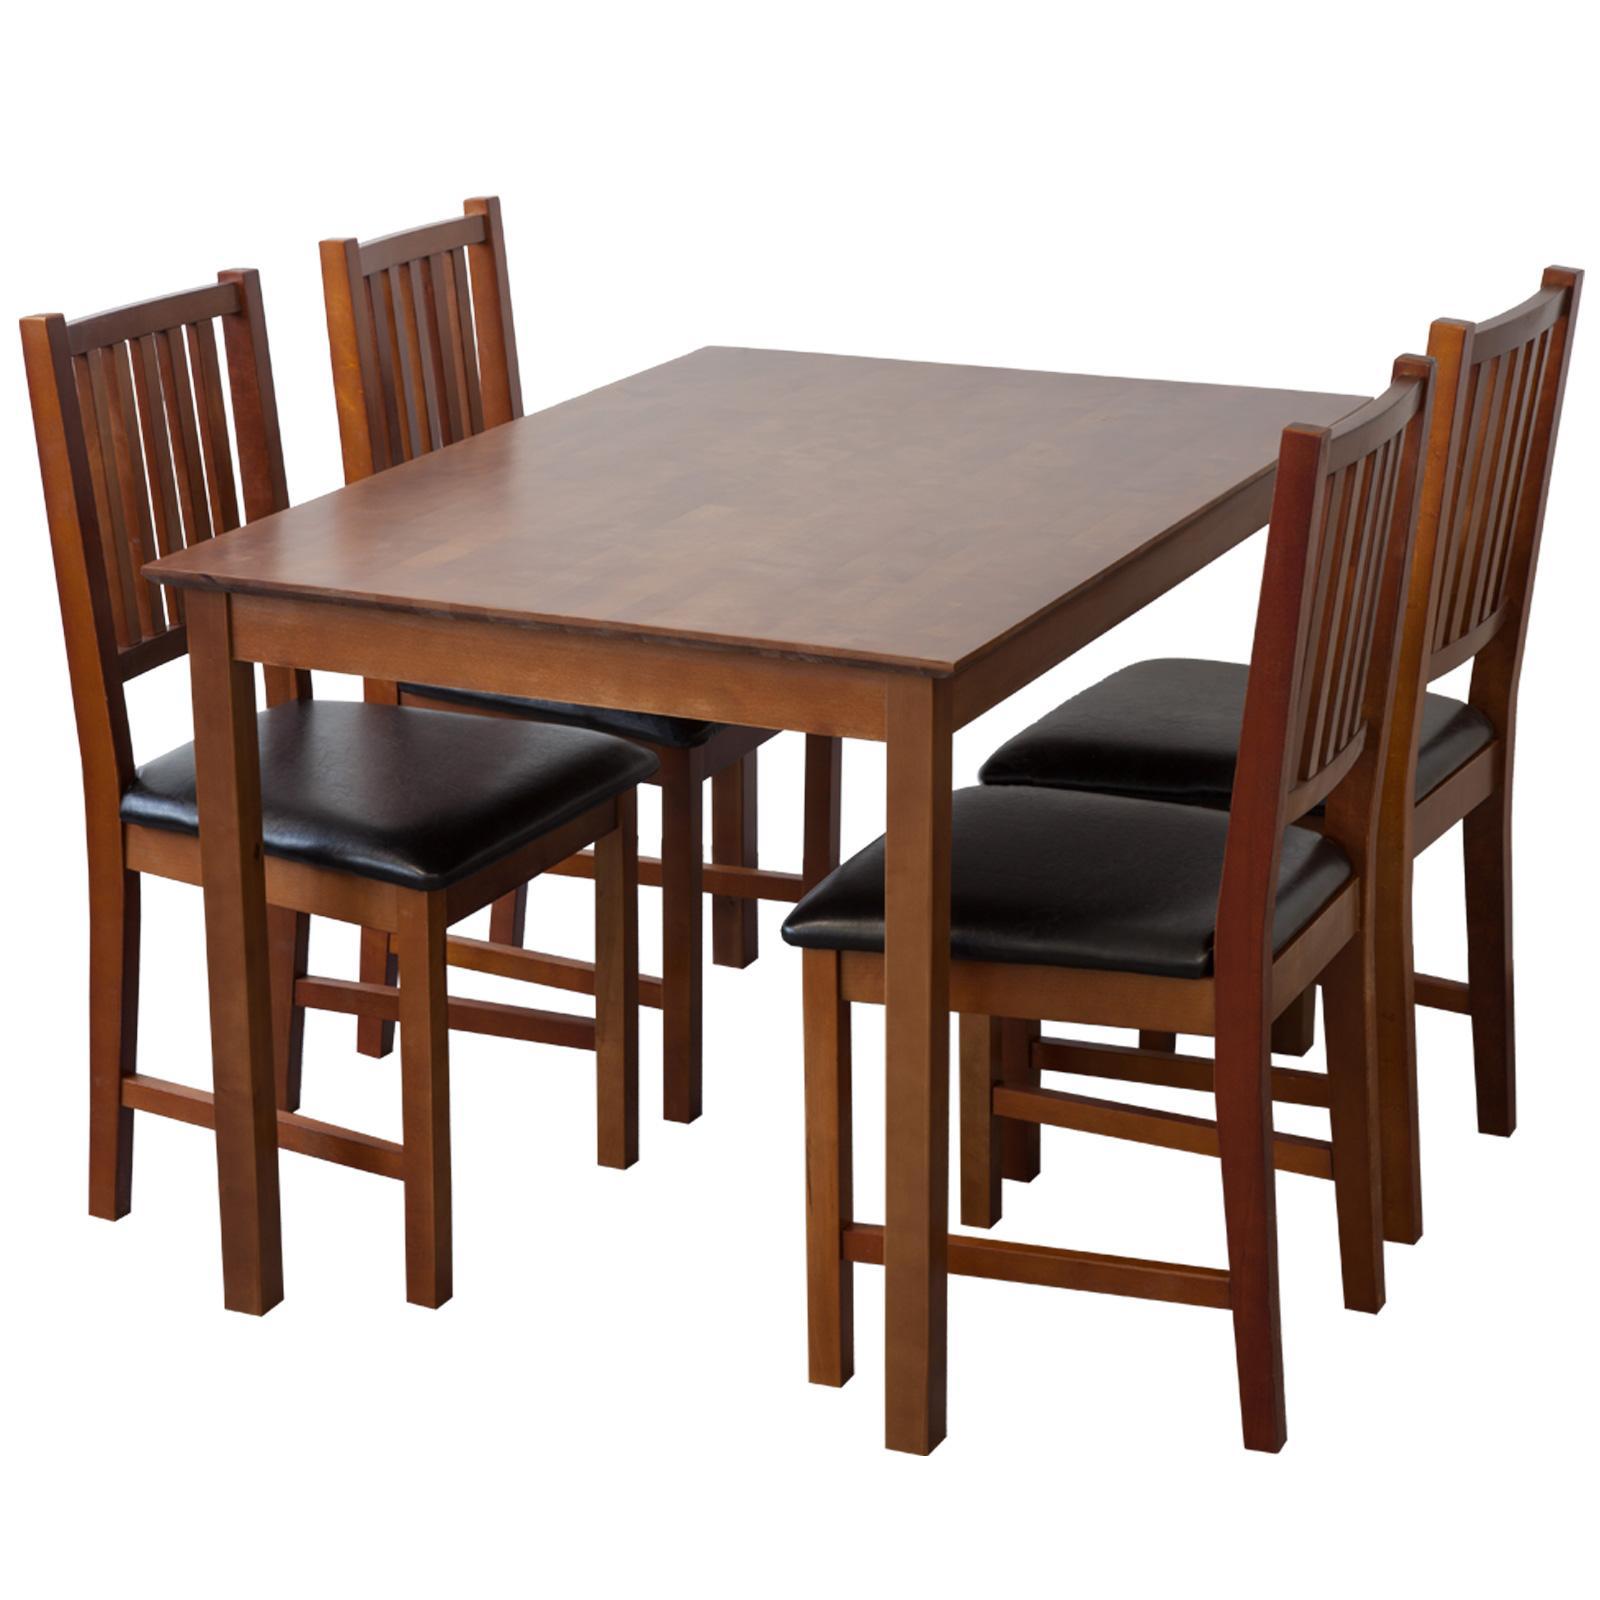 esszimmerst hle lucca nussbaum 2 x st hle k che haushalt. Black Bedroom Furniture Sets. Home Design Ideas